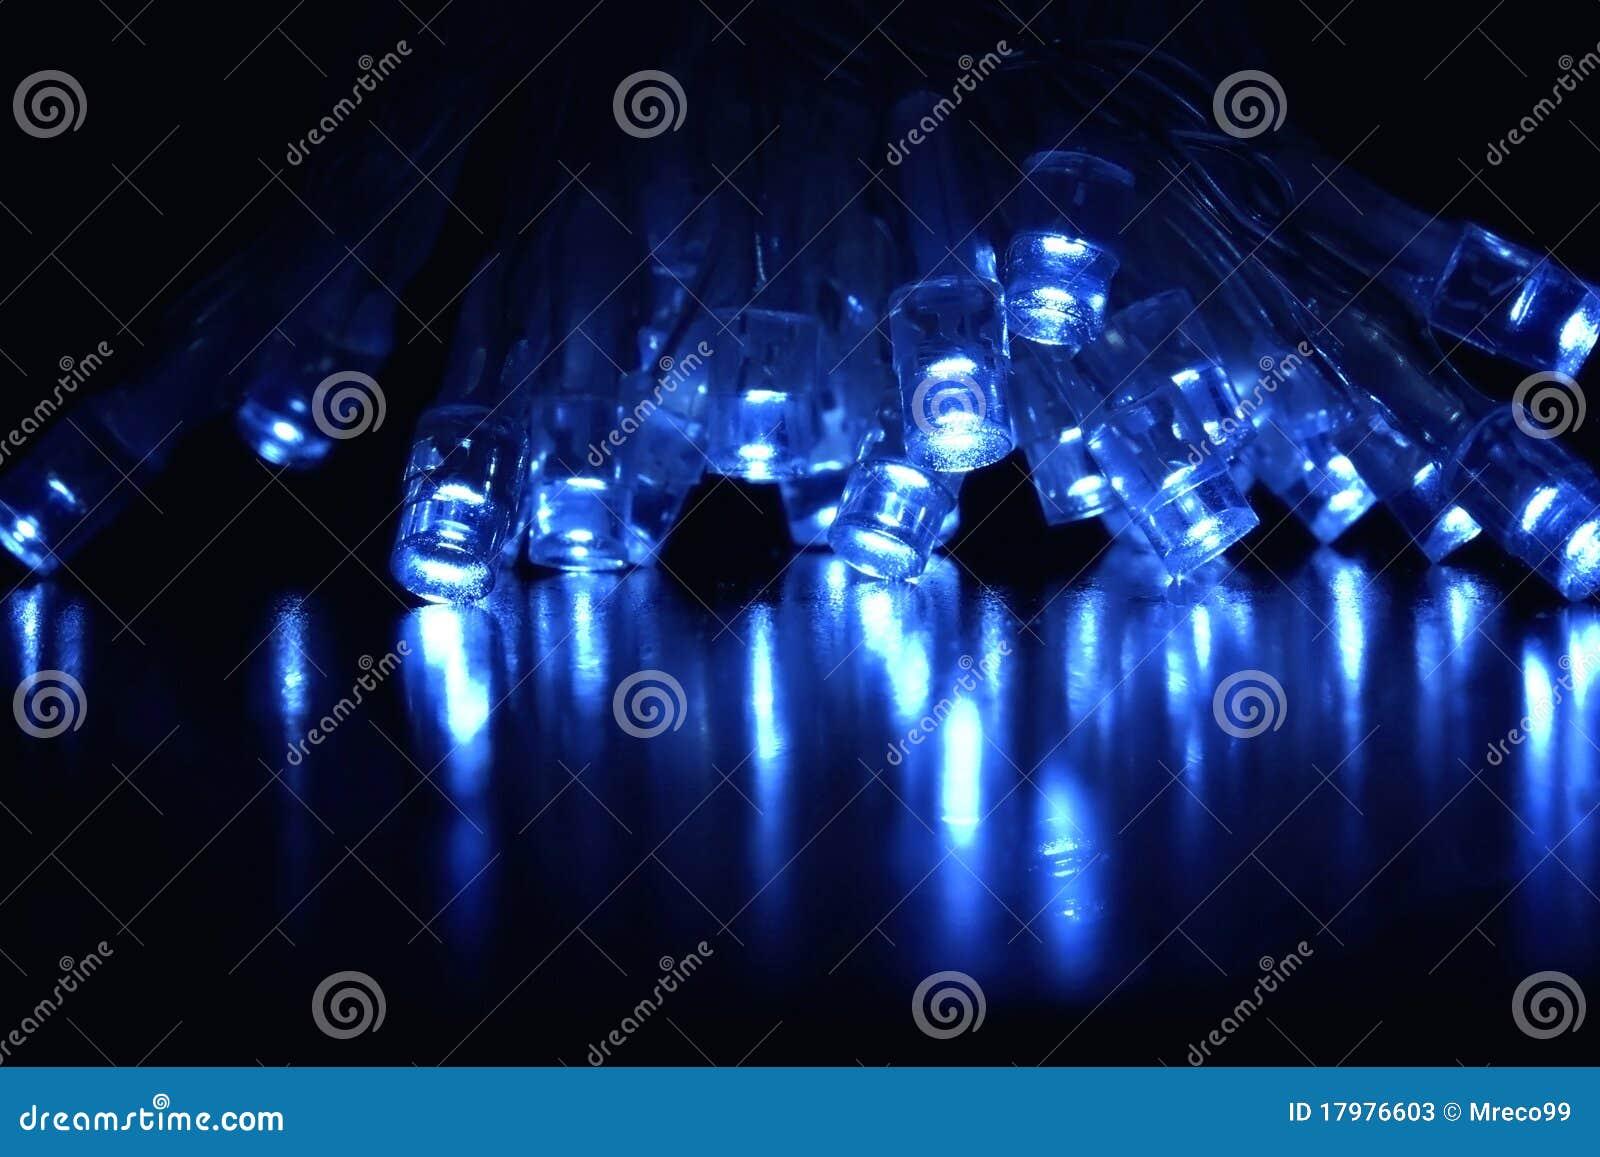 Cool Blue LED Lights Stock Photos Image 17976603